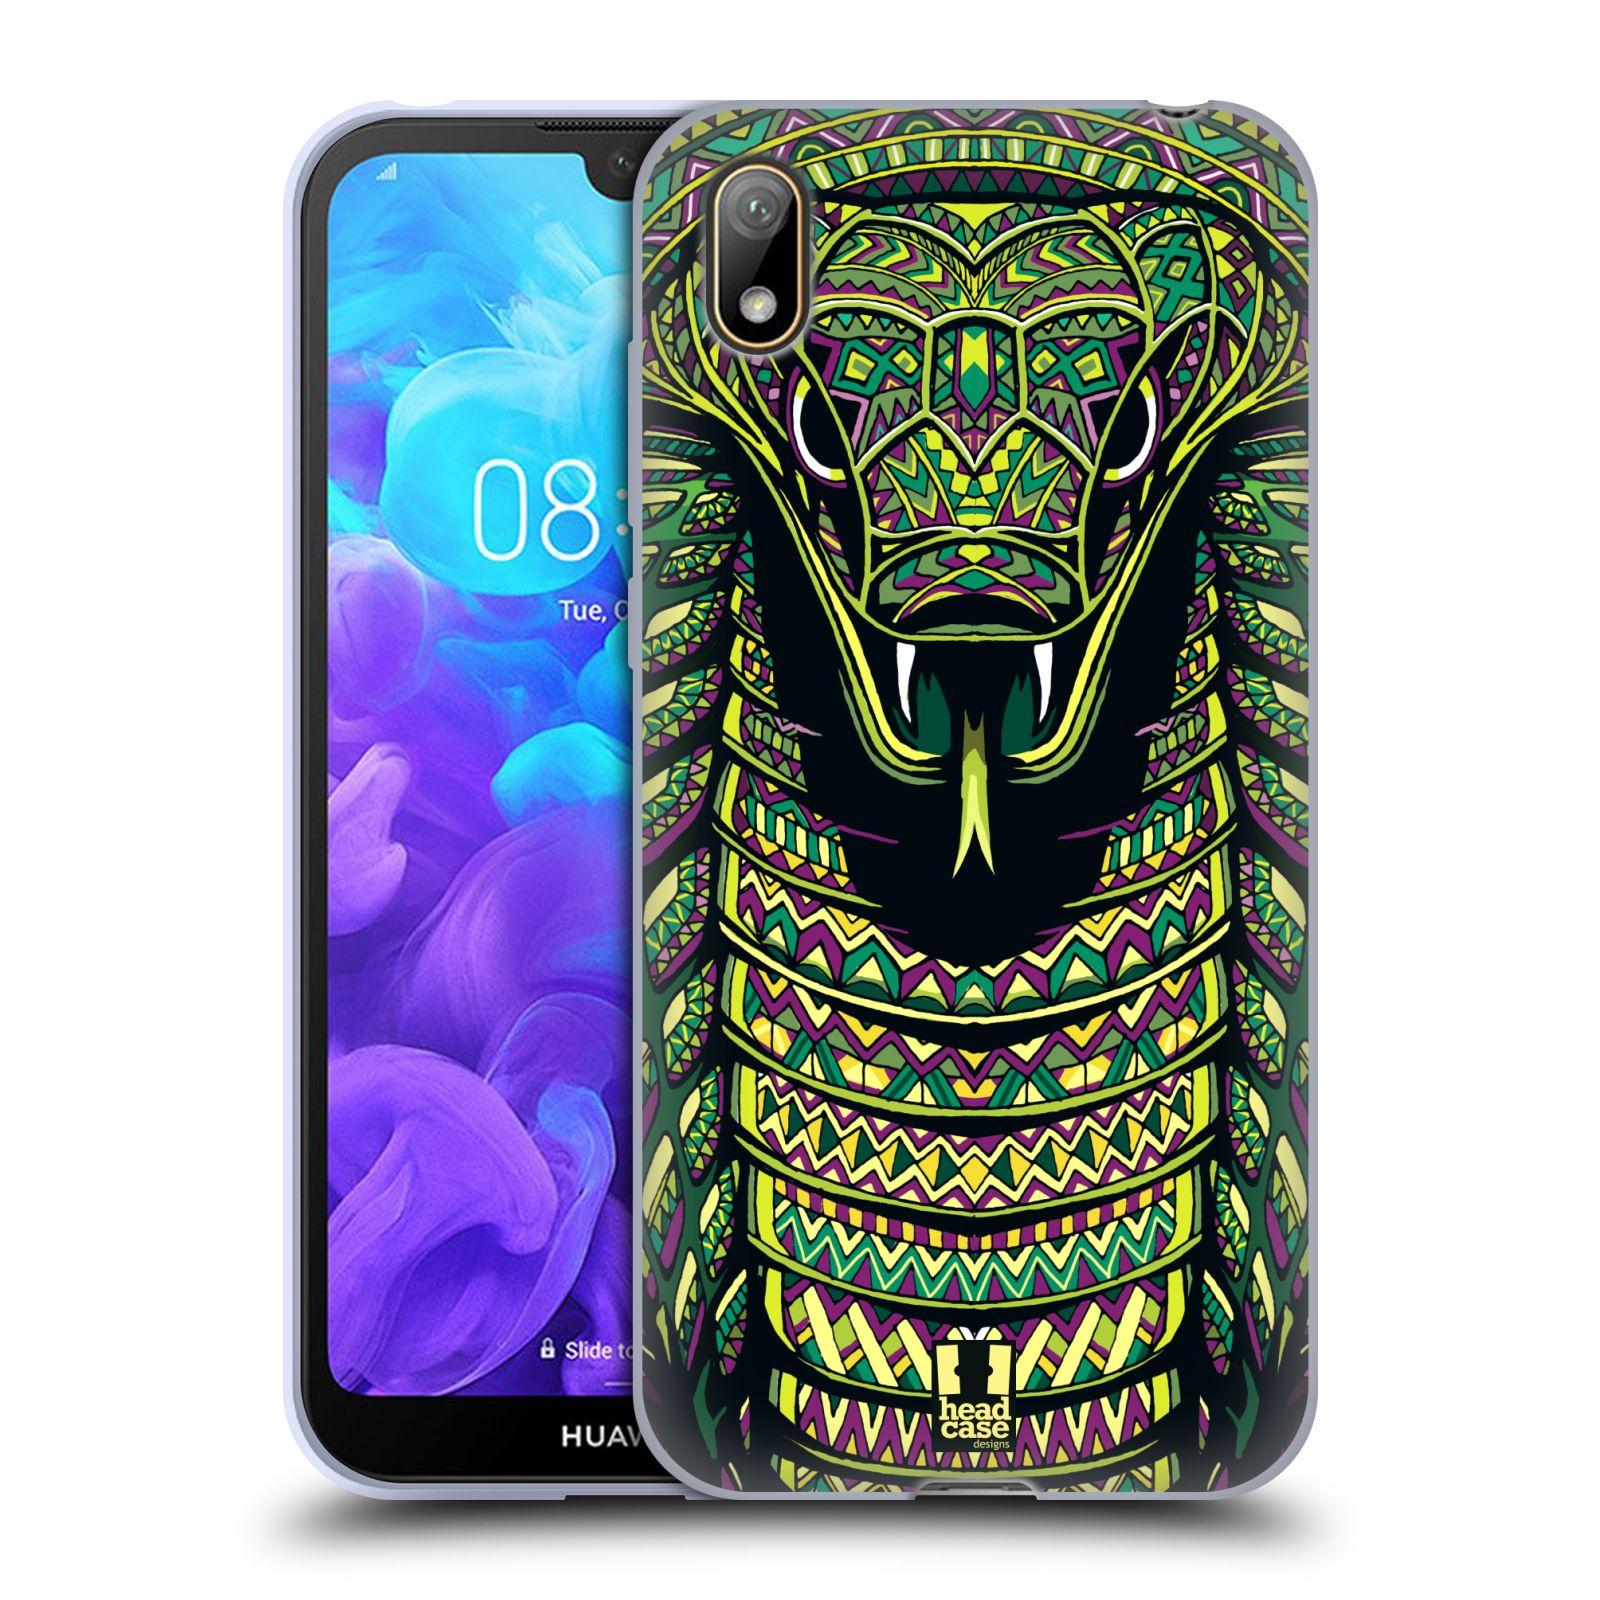 Silikonové pouzdro na mobil Huawei Y5 (2019) - Head Case - AZTEC HAD